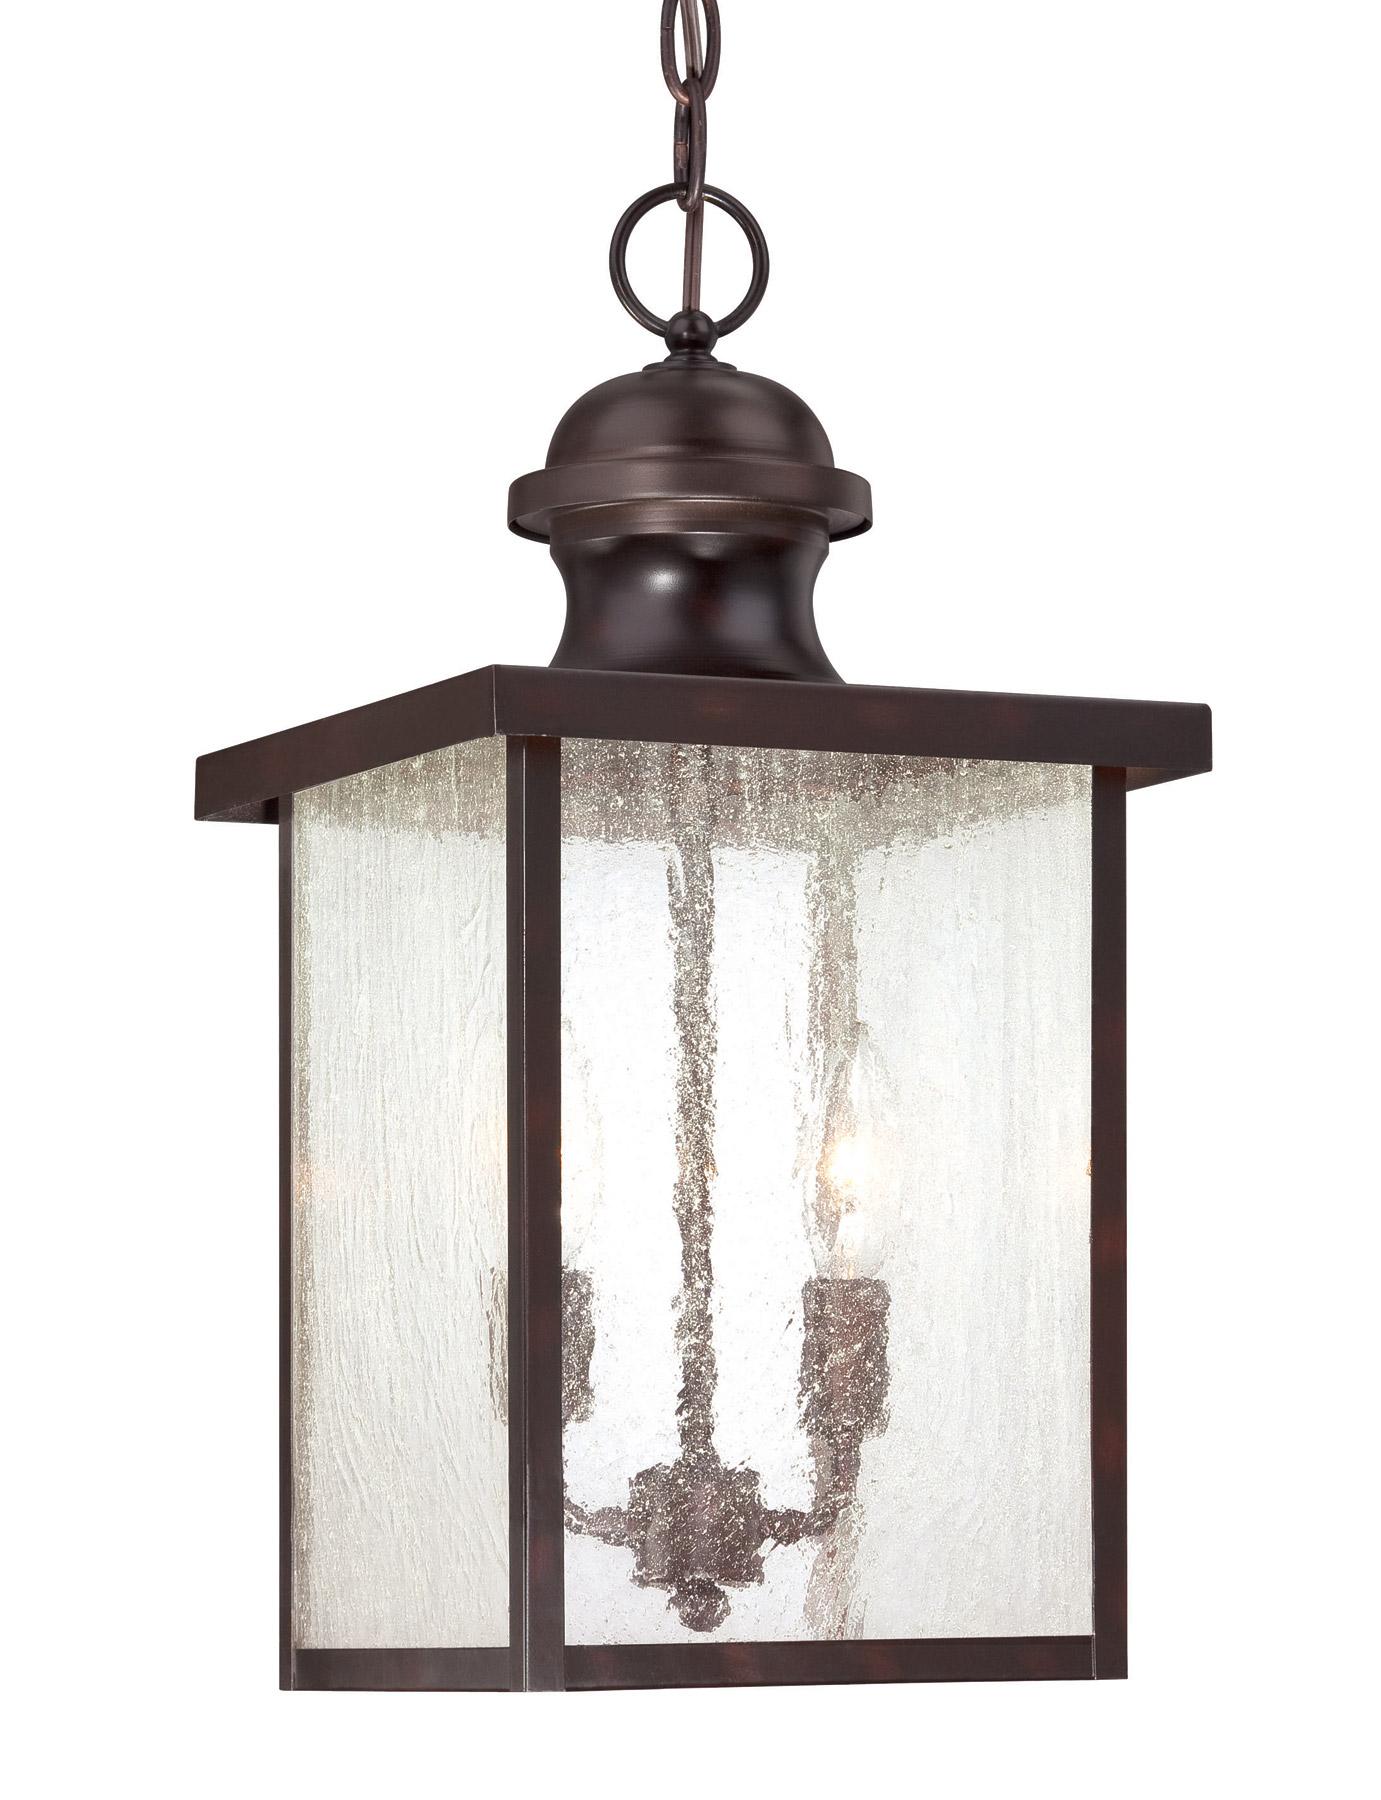 Savoy House 5 603 13 Newberry Hanging Exterior Lantern